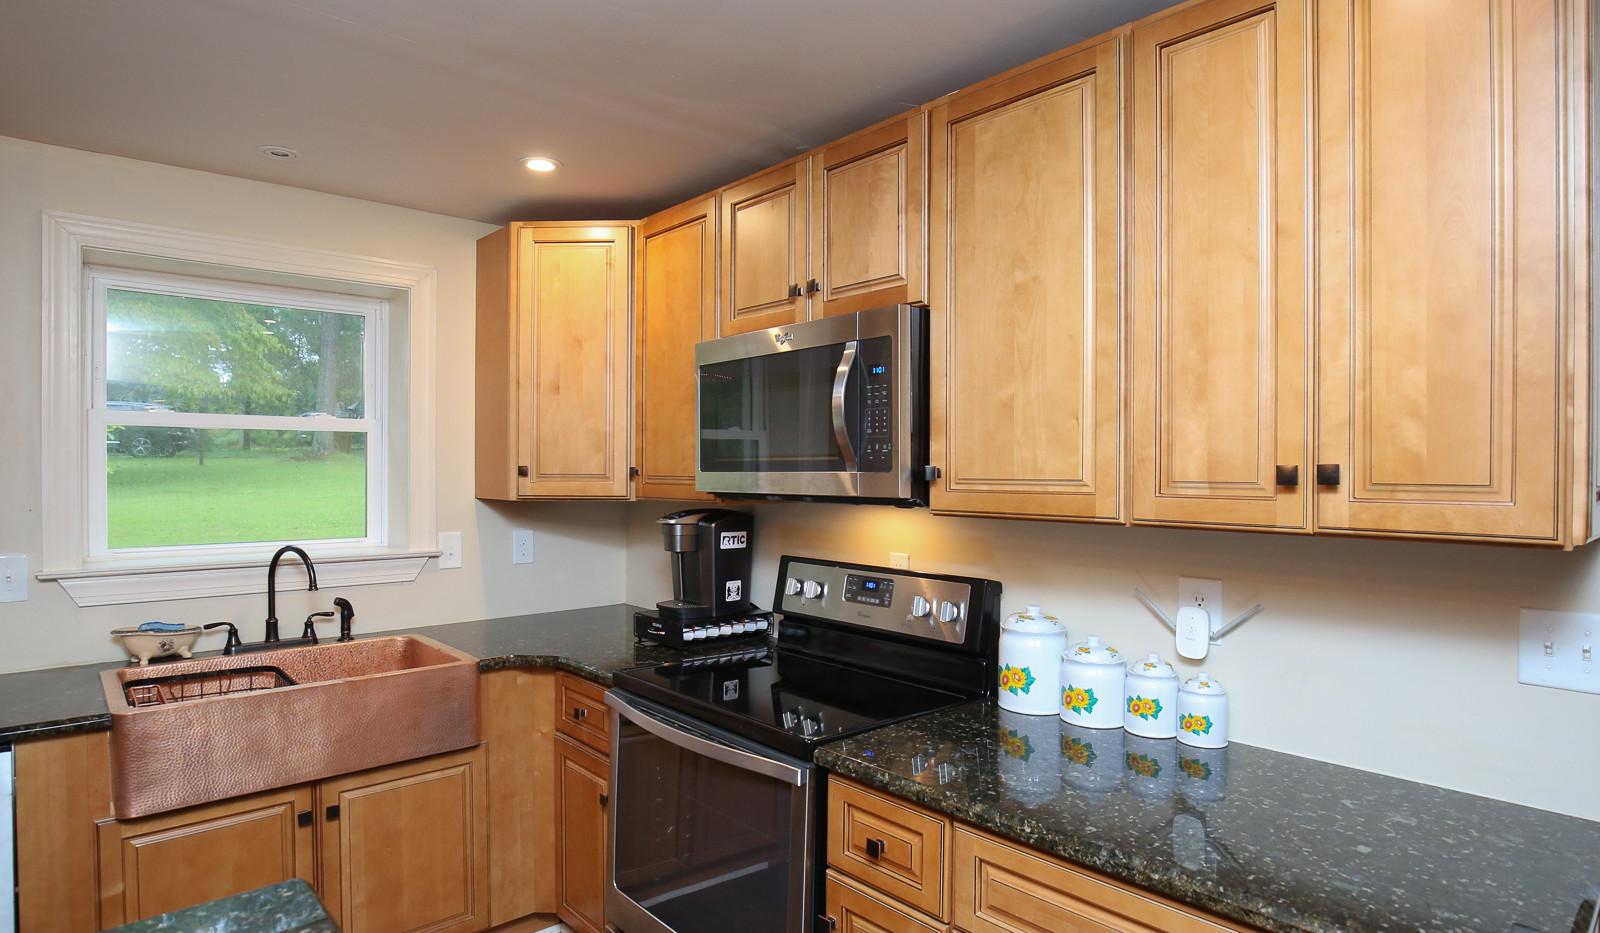 038_294_barnes_ave_kitchen.jpg